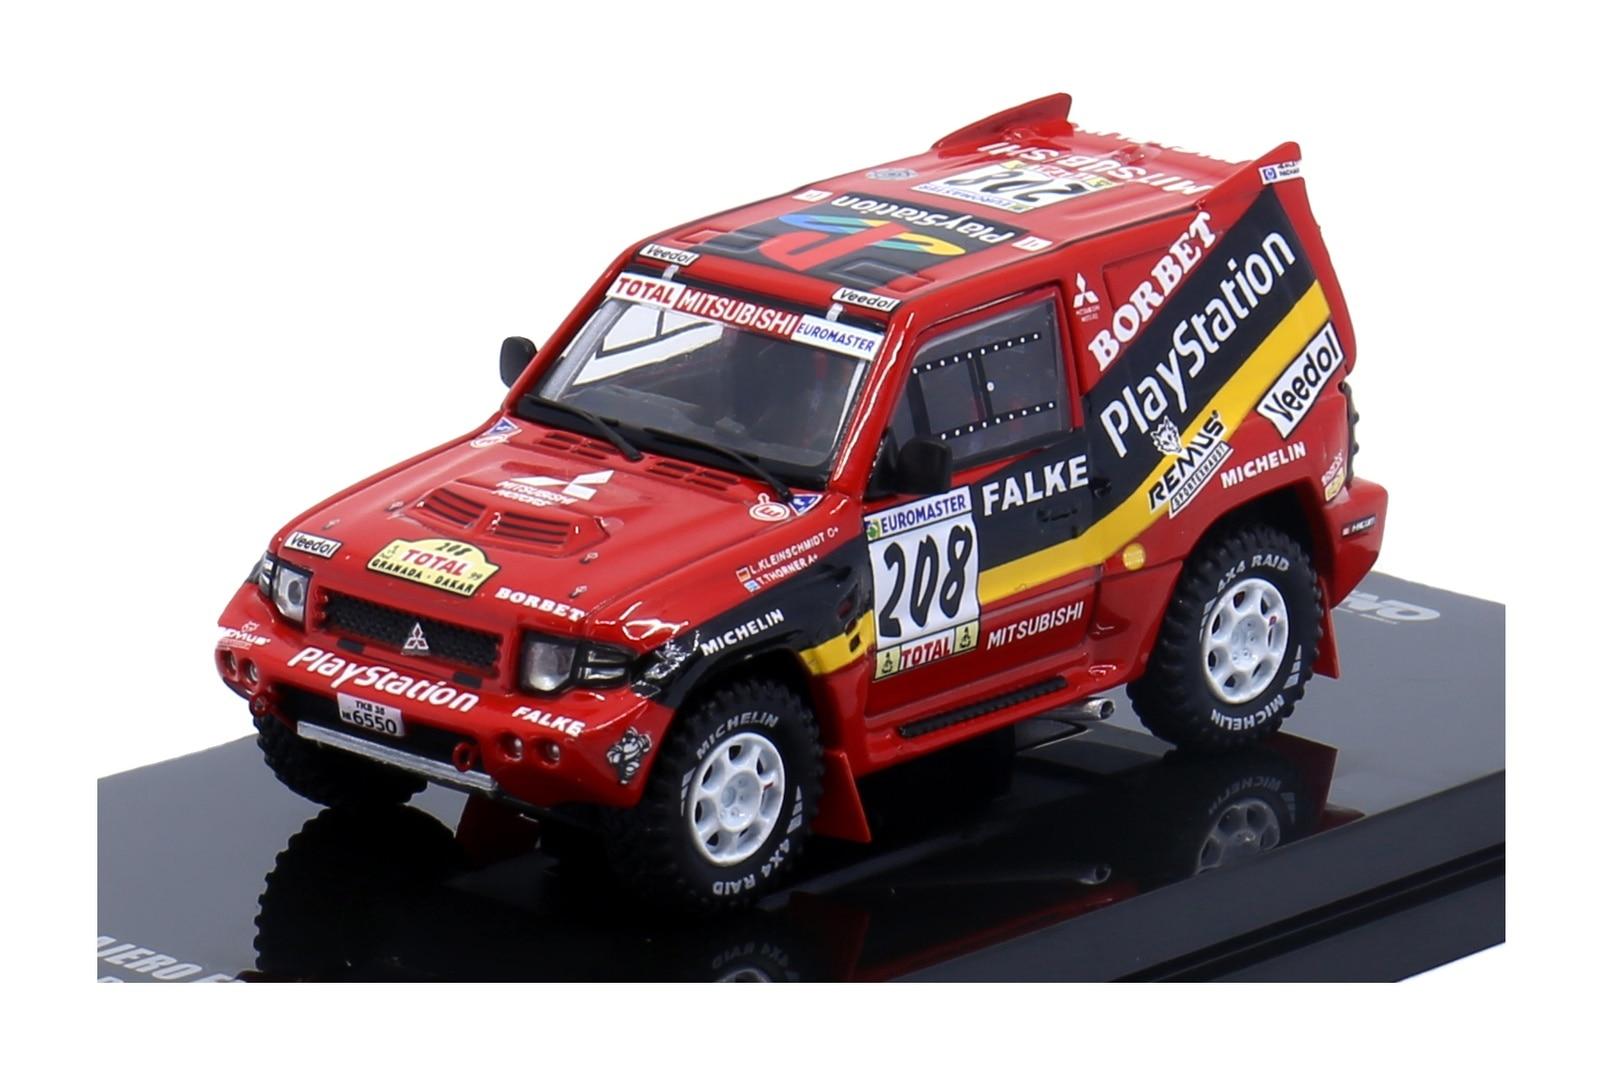 Inno64 164 mitsubishi pajero evolution #208 playstation granada-dakar diecast modelo de carro